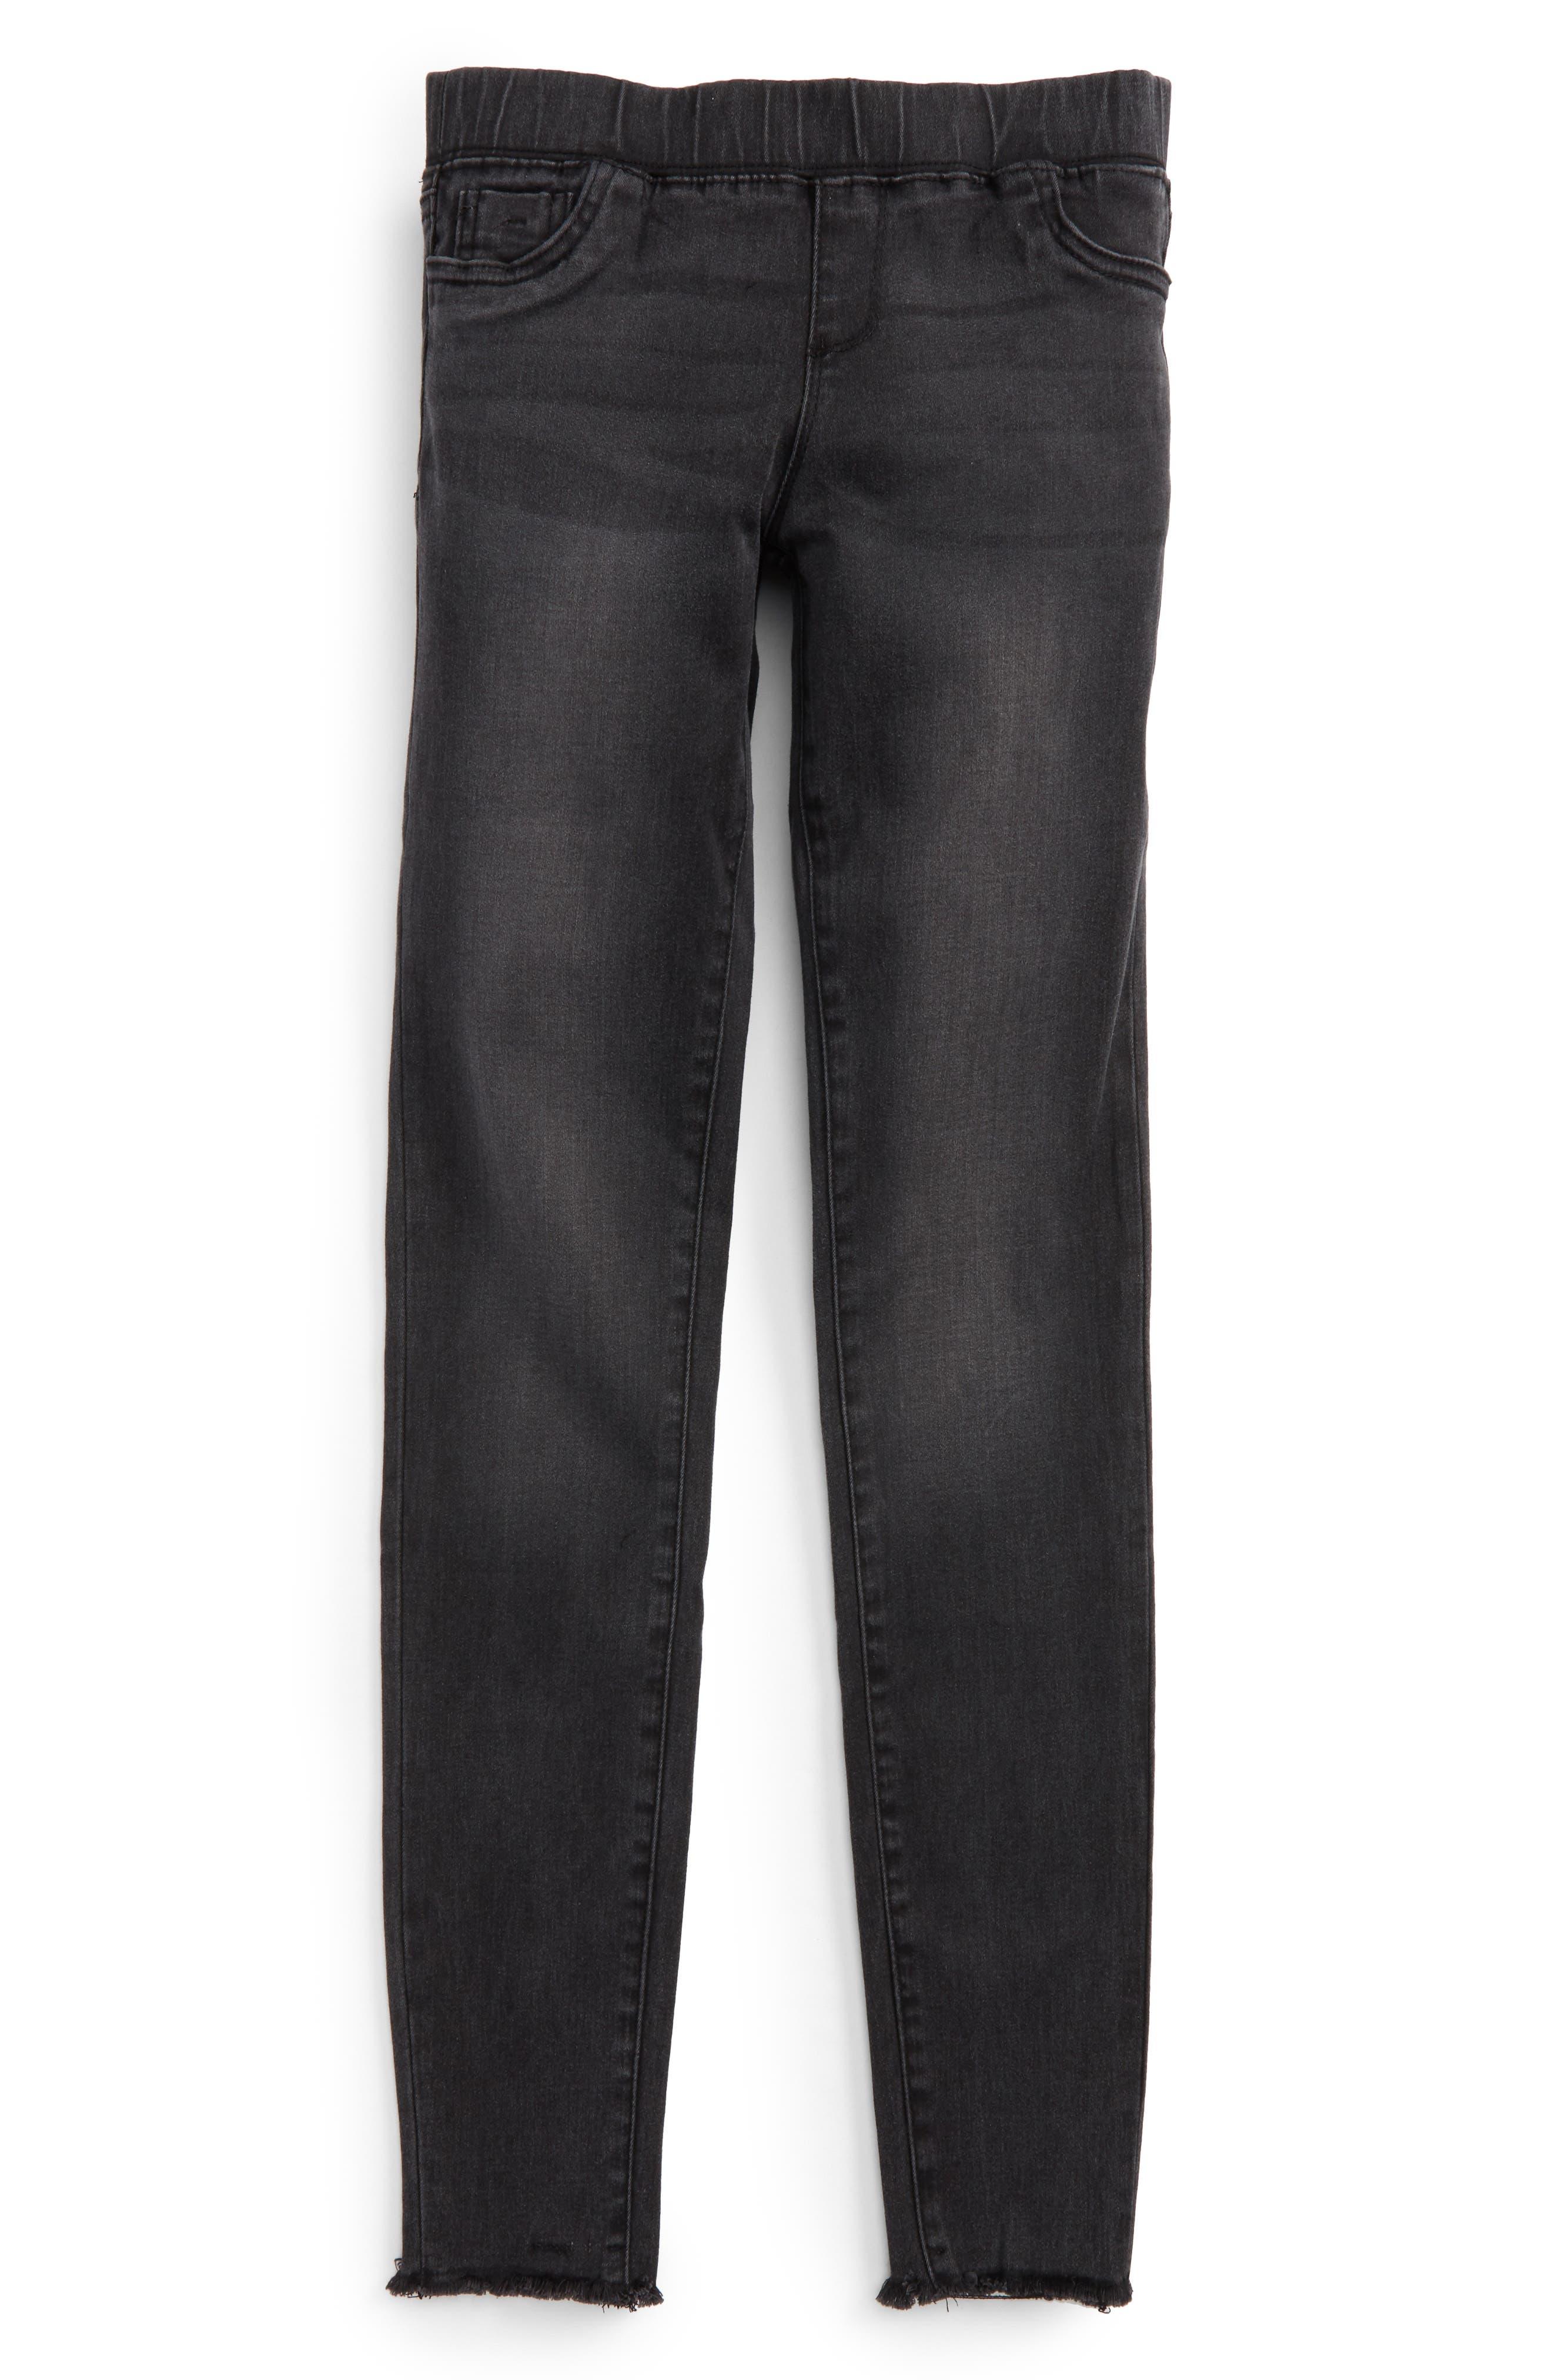 Main Image - Tractr Frayed Denim Pants (Big Girls)